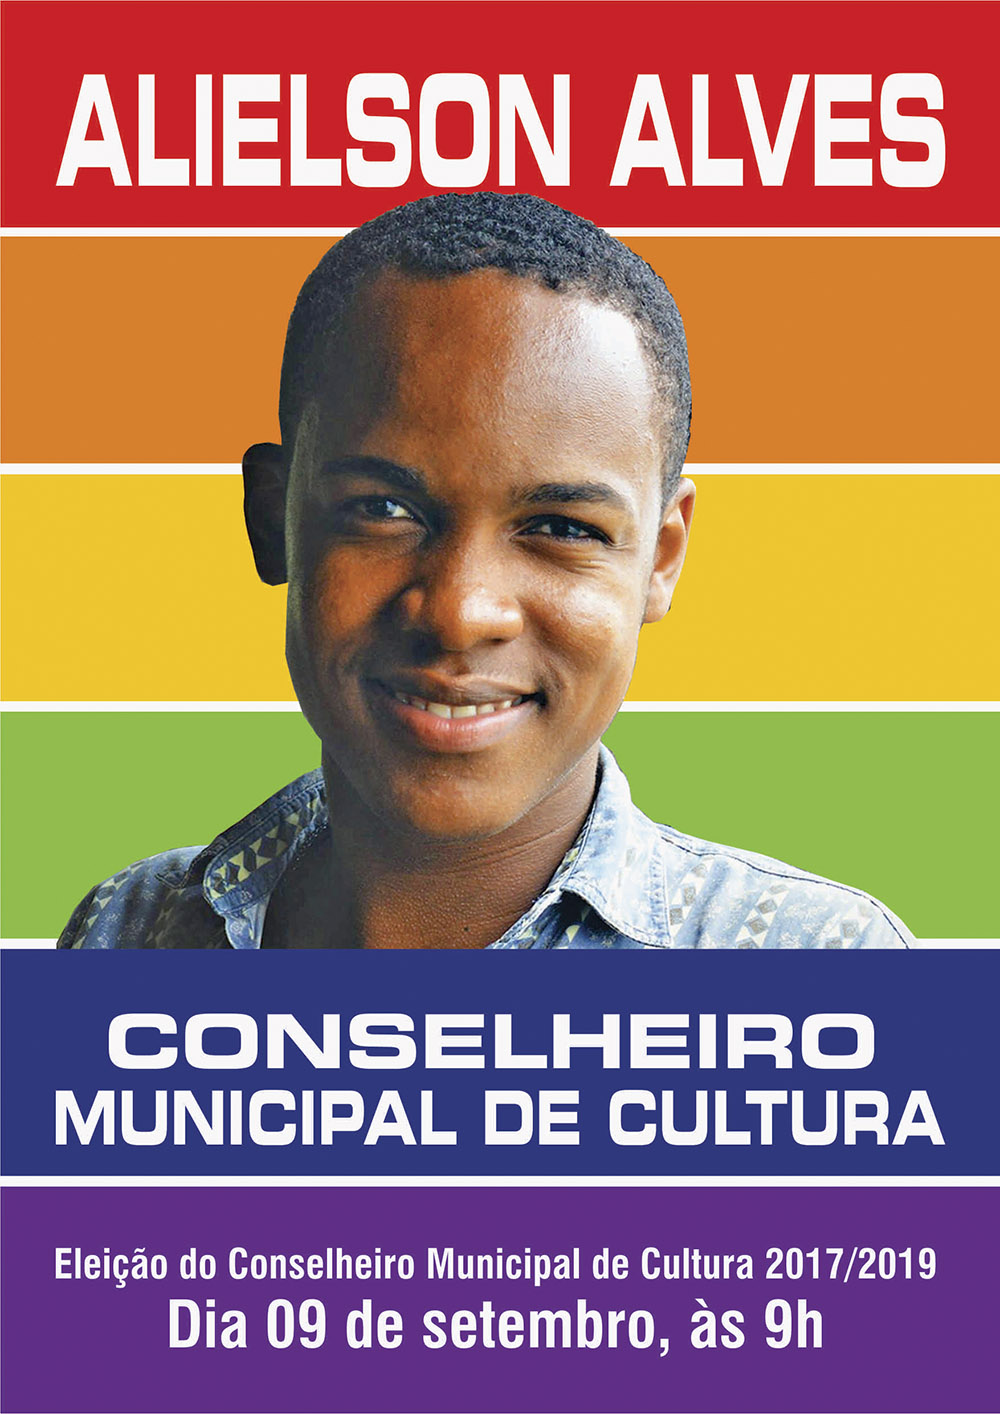 Dirigente do Sinttel se candidata  a Conselheiro de Cultura de FSA